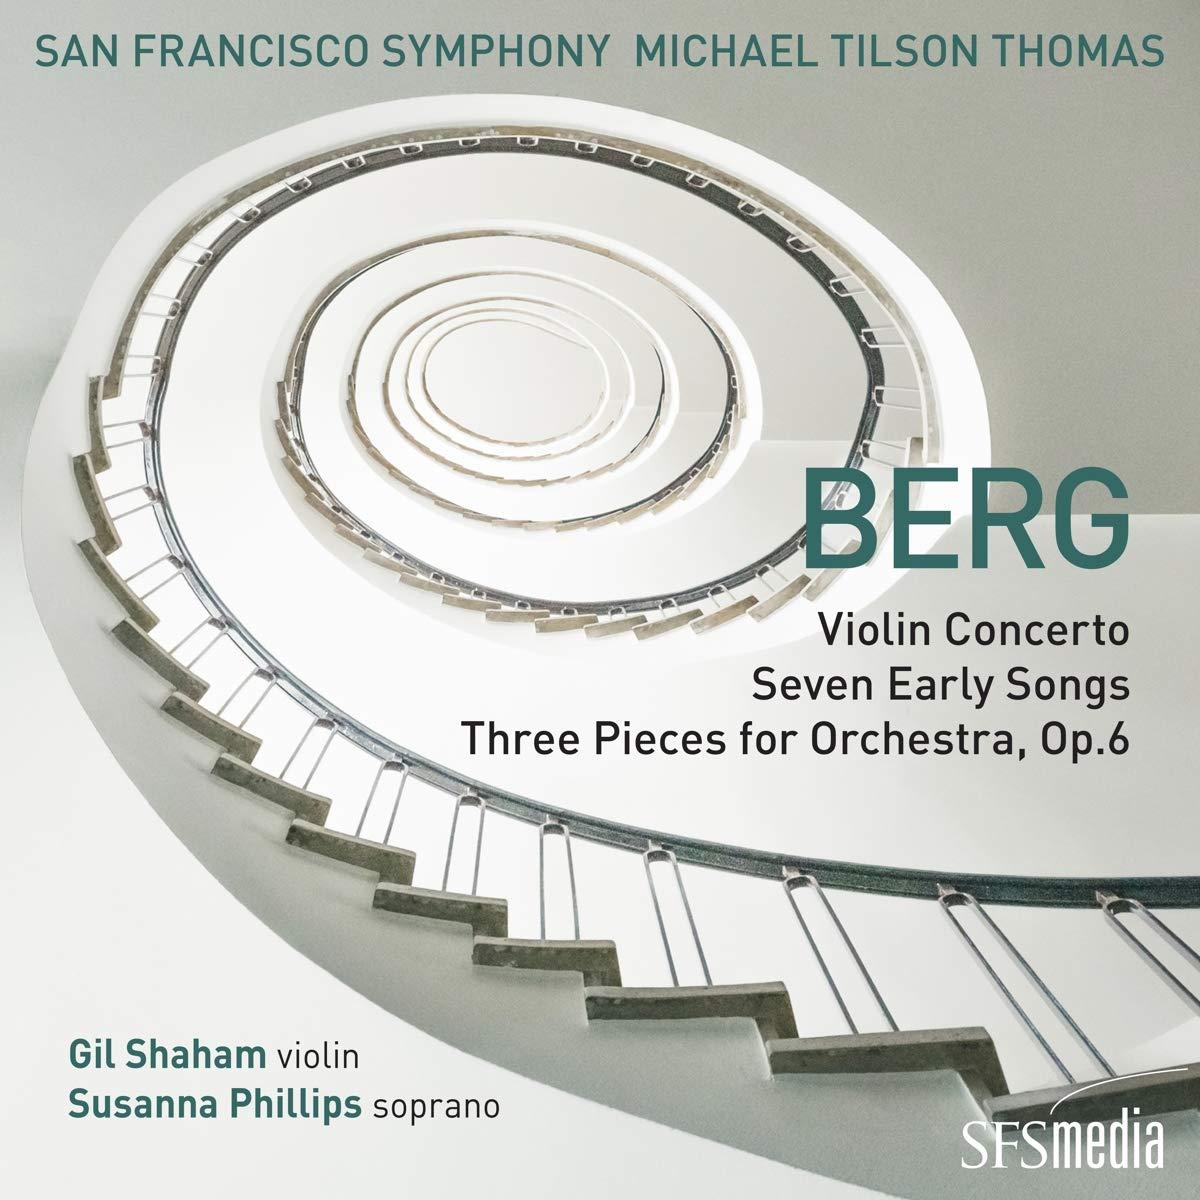 CD-Rezension: BERG, San Francisco Symphony, Michael Tilson Thomas